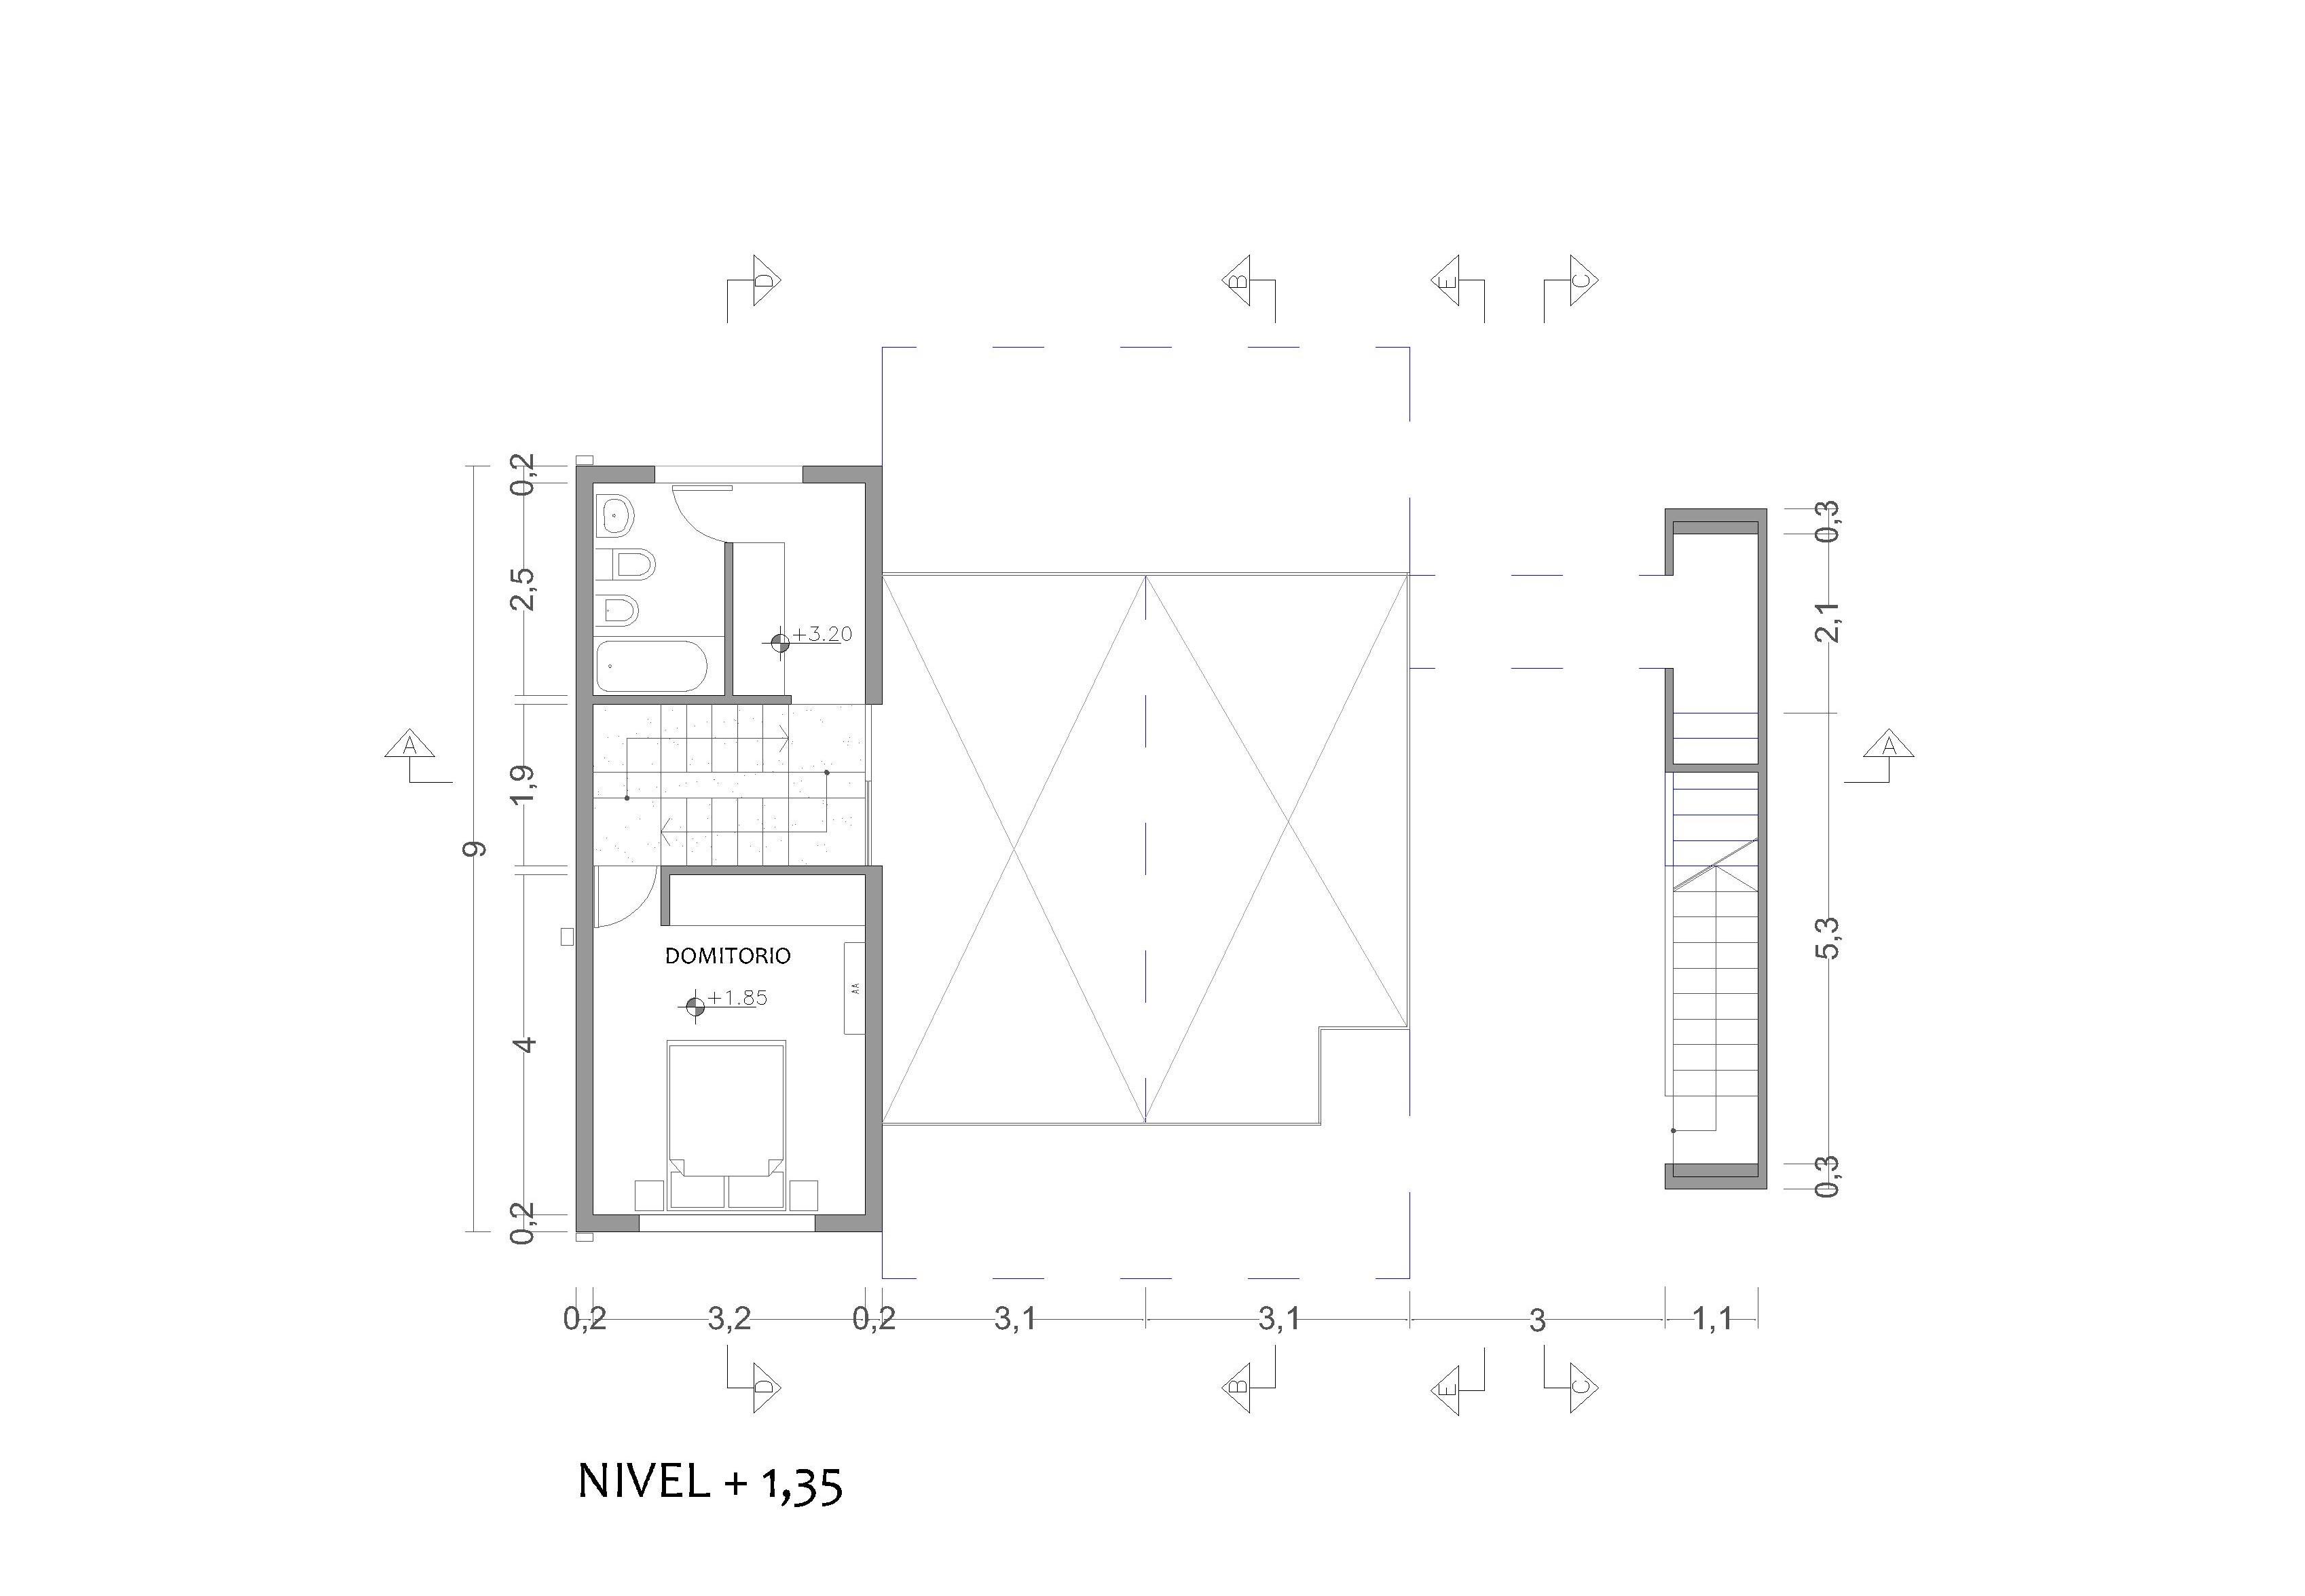 NIVEL 1.35MTS